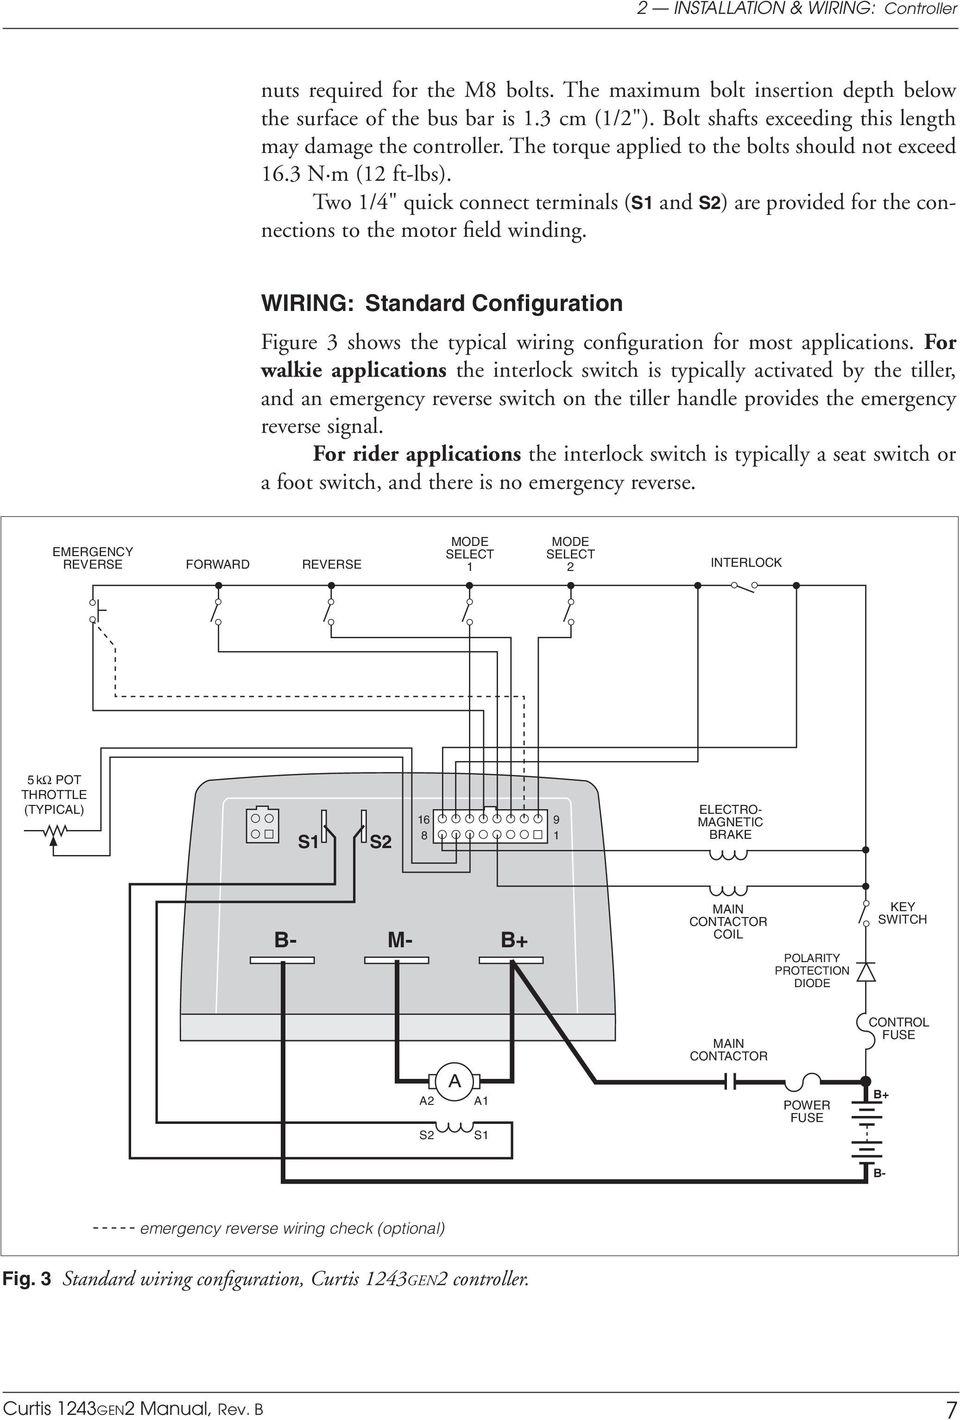 medium resolution of generation 2 curtis instruments inc multimode motor controller pdfcurtis 1243gen2 manual rev b 7